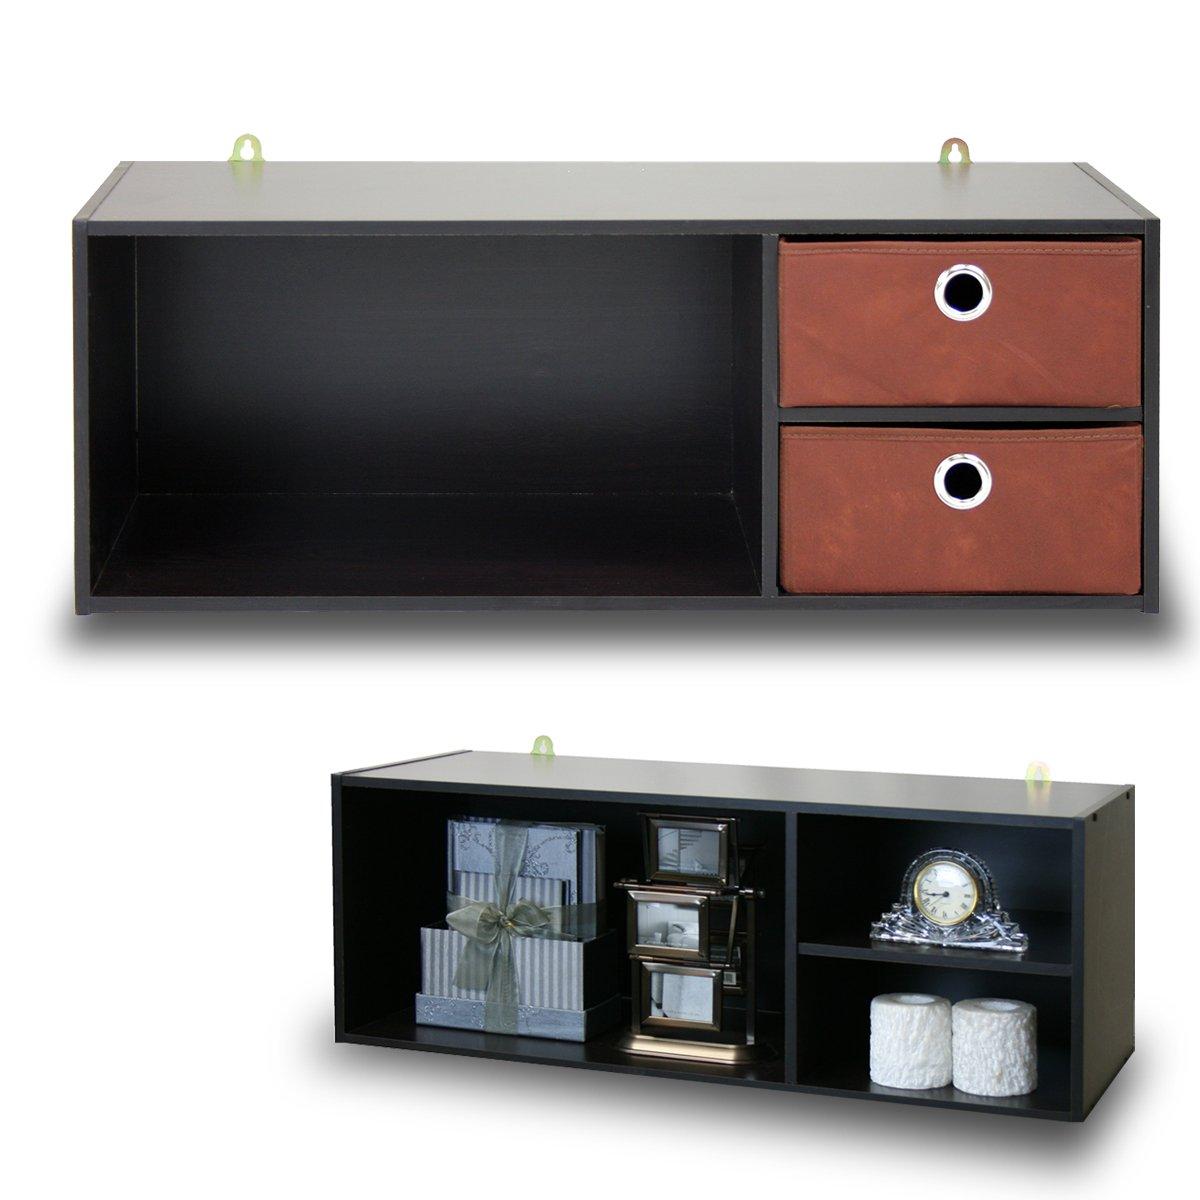 Furinno 10005EX/BR Wall-mounted Storage Shelf with 2 Bin Drawers, Espresso/Brown